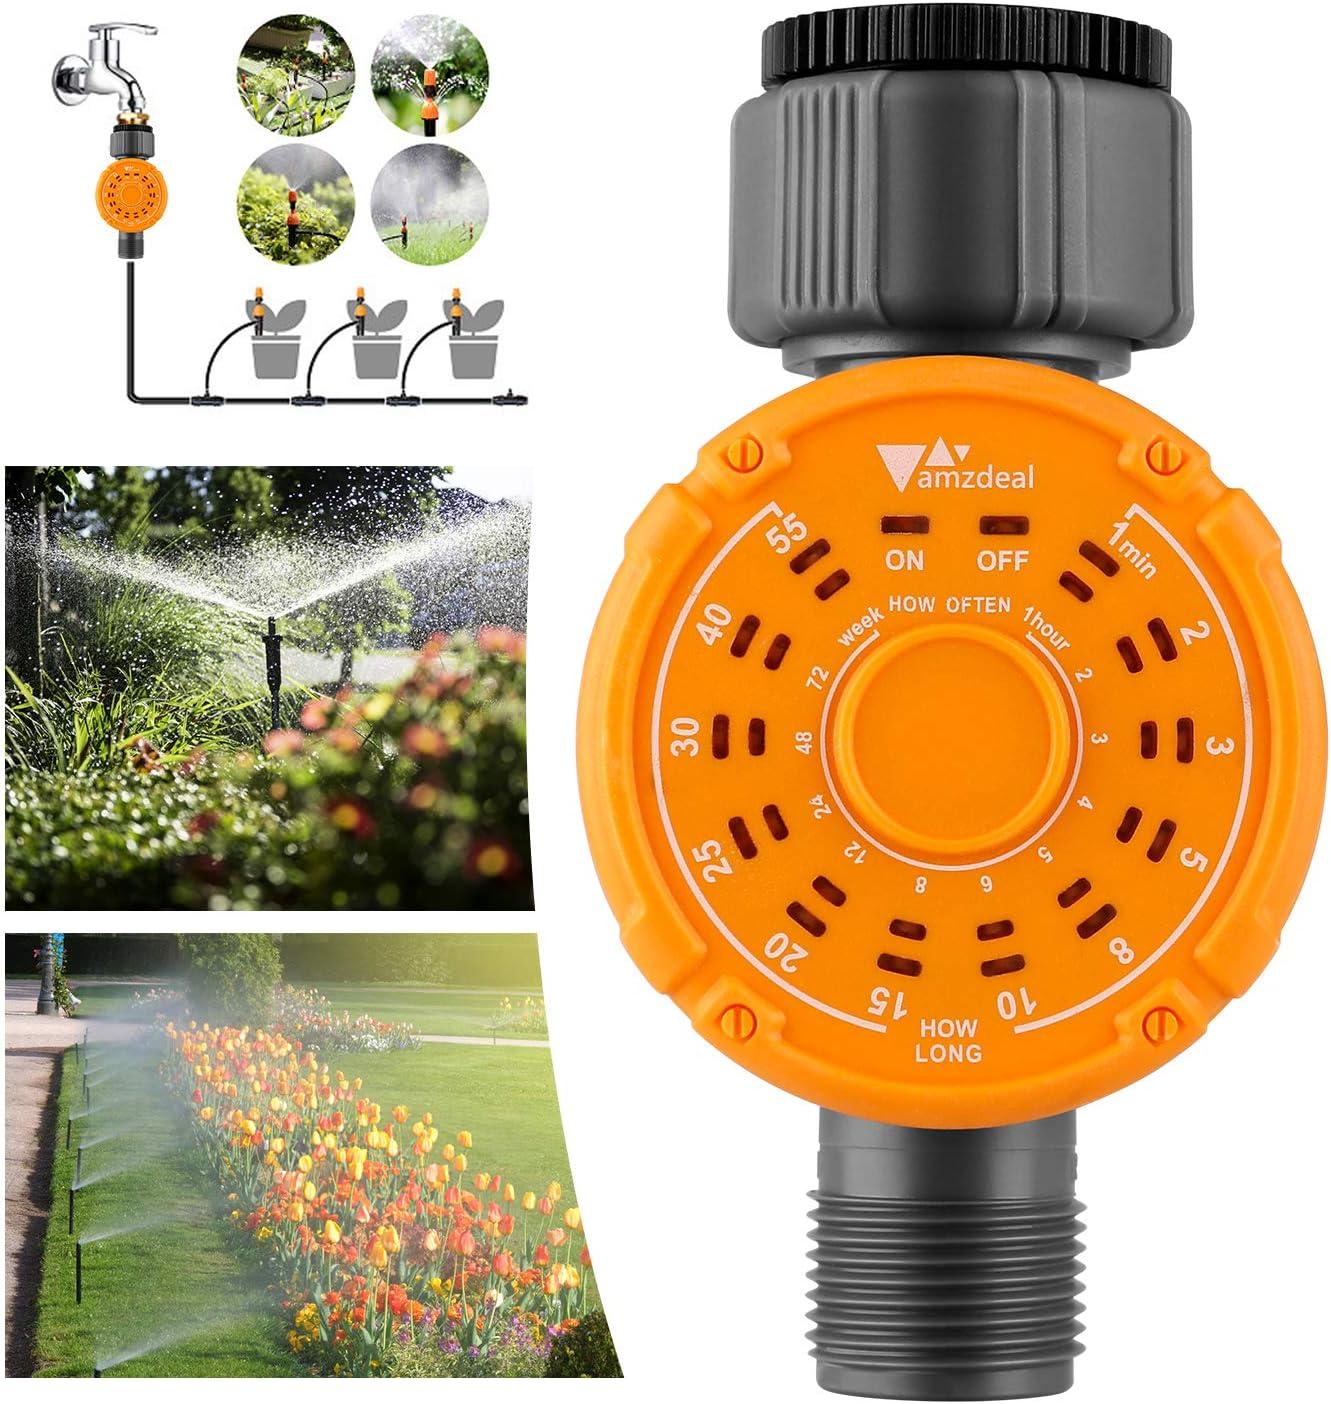 amzdeal Bew/ässerungscomputer Digitaler Wasserzeitschaltuhr Wasserdicht Garten Bew/ässerungsuhr f/ür Blumenbew/ässerung Rasenbew/ässerung